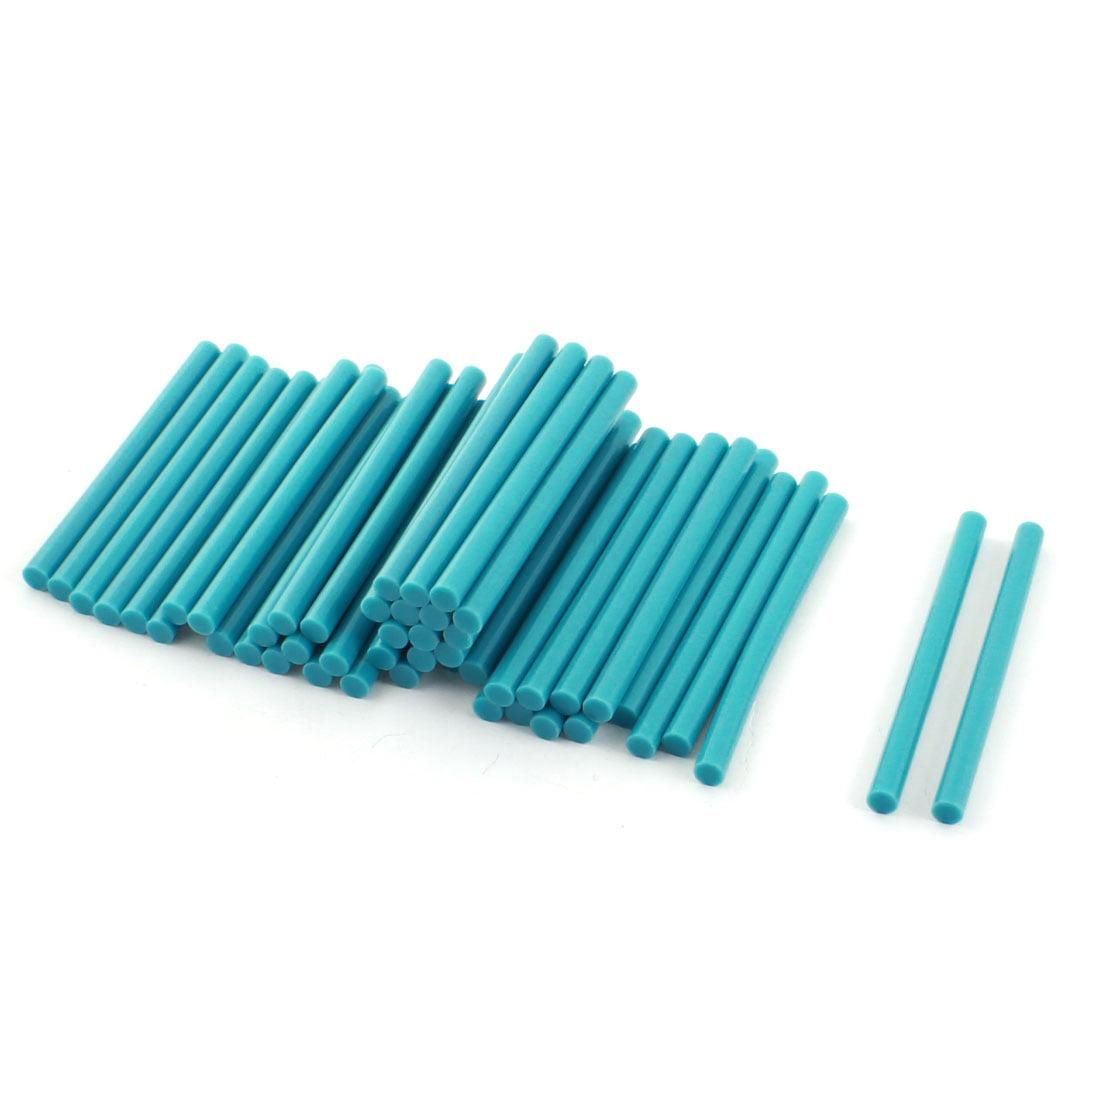 50 Pieces Teal Hot Melt Glue Gun Adhesive Sticks 7mm x 100mm by